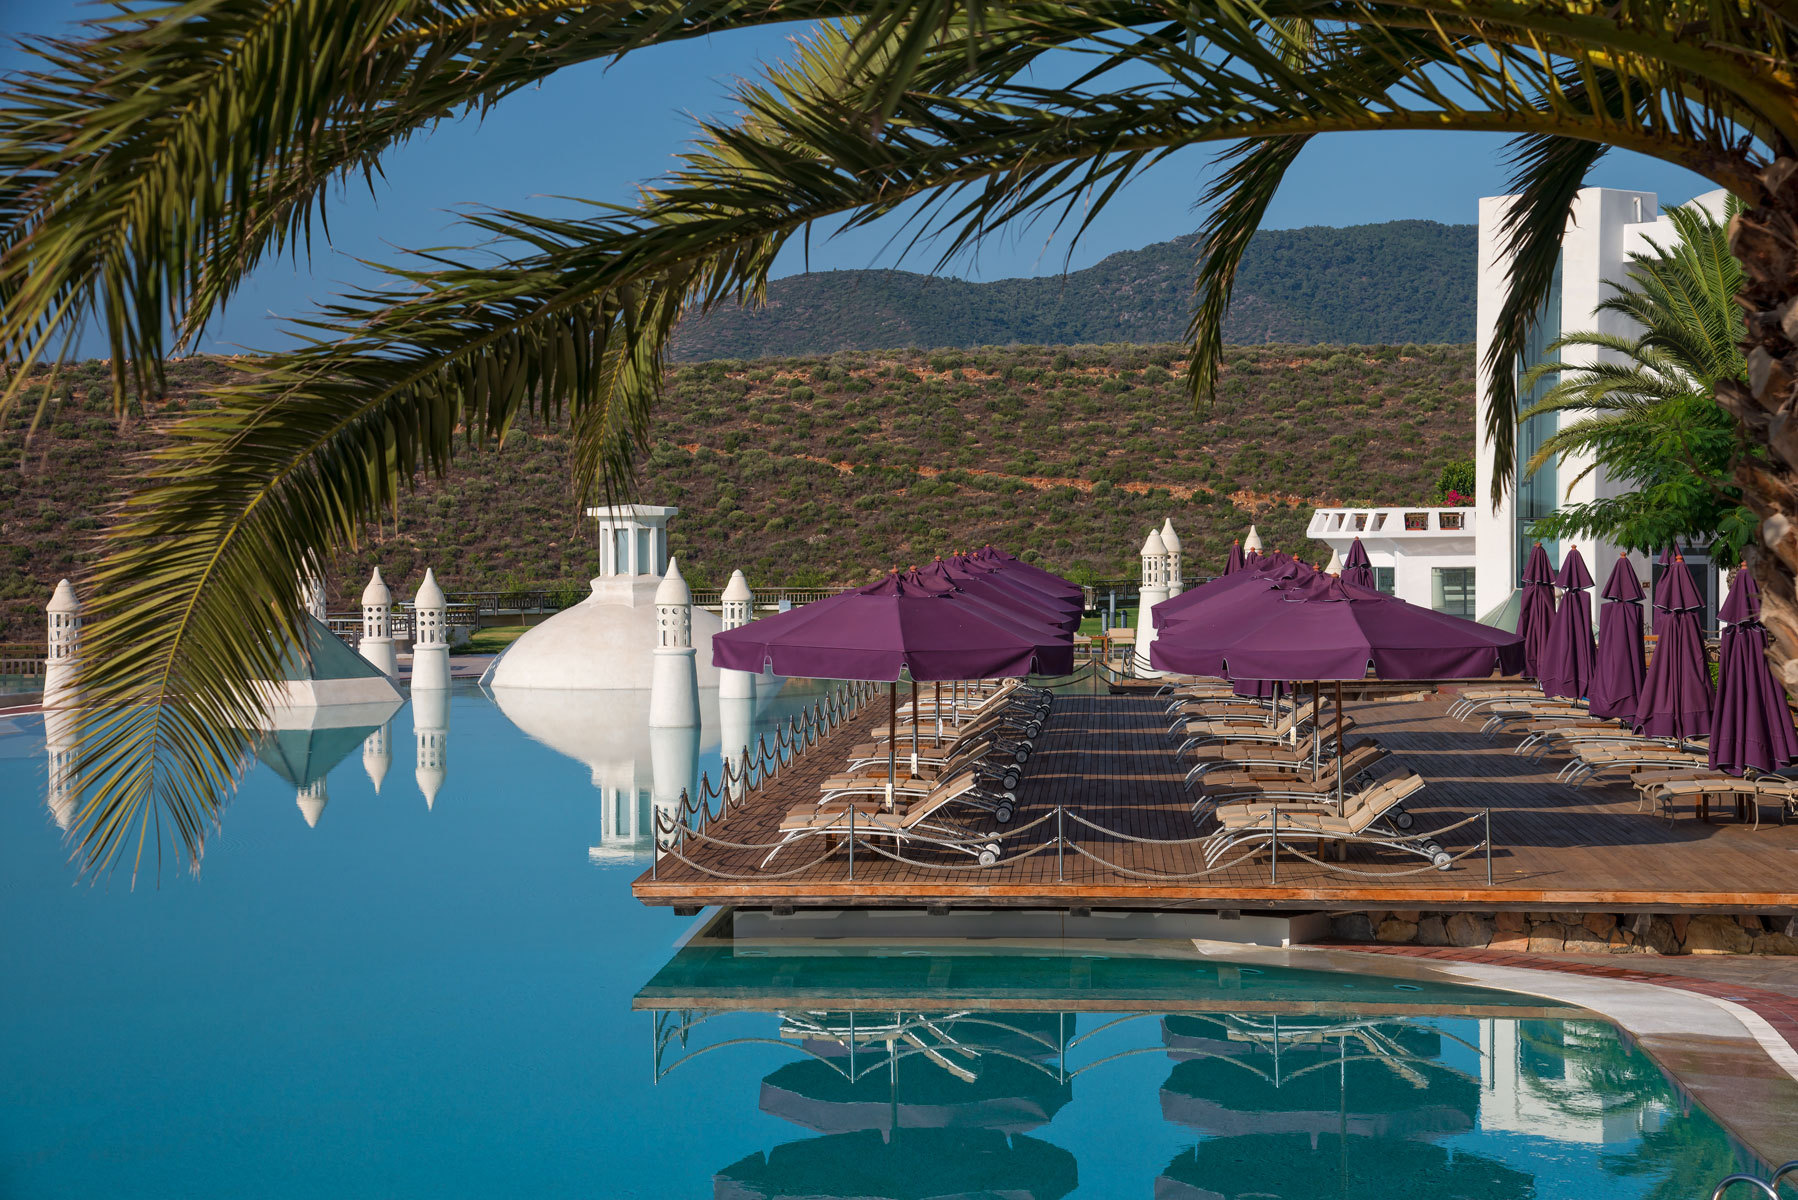 Kempinski Hotel Barbaros Bay, Bodrum, Turkey